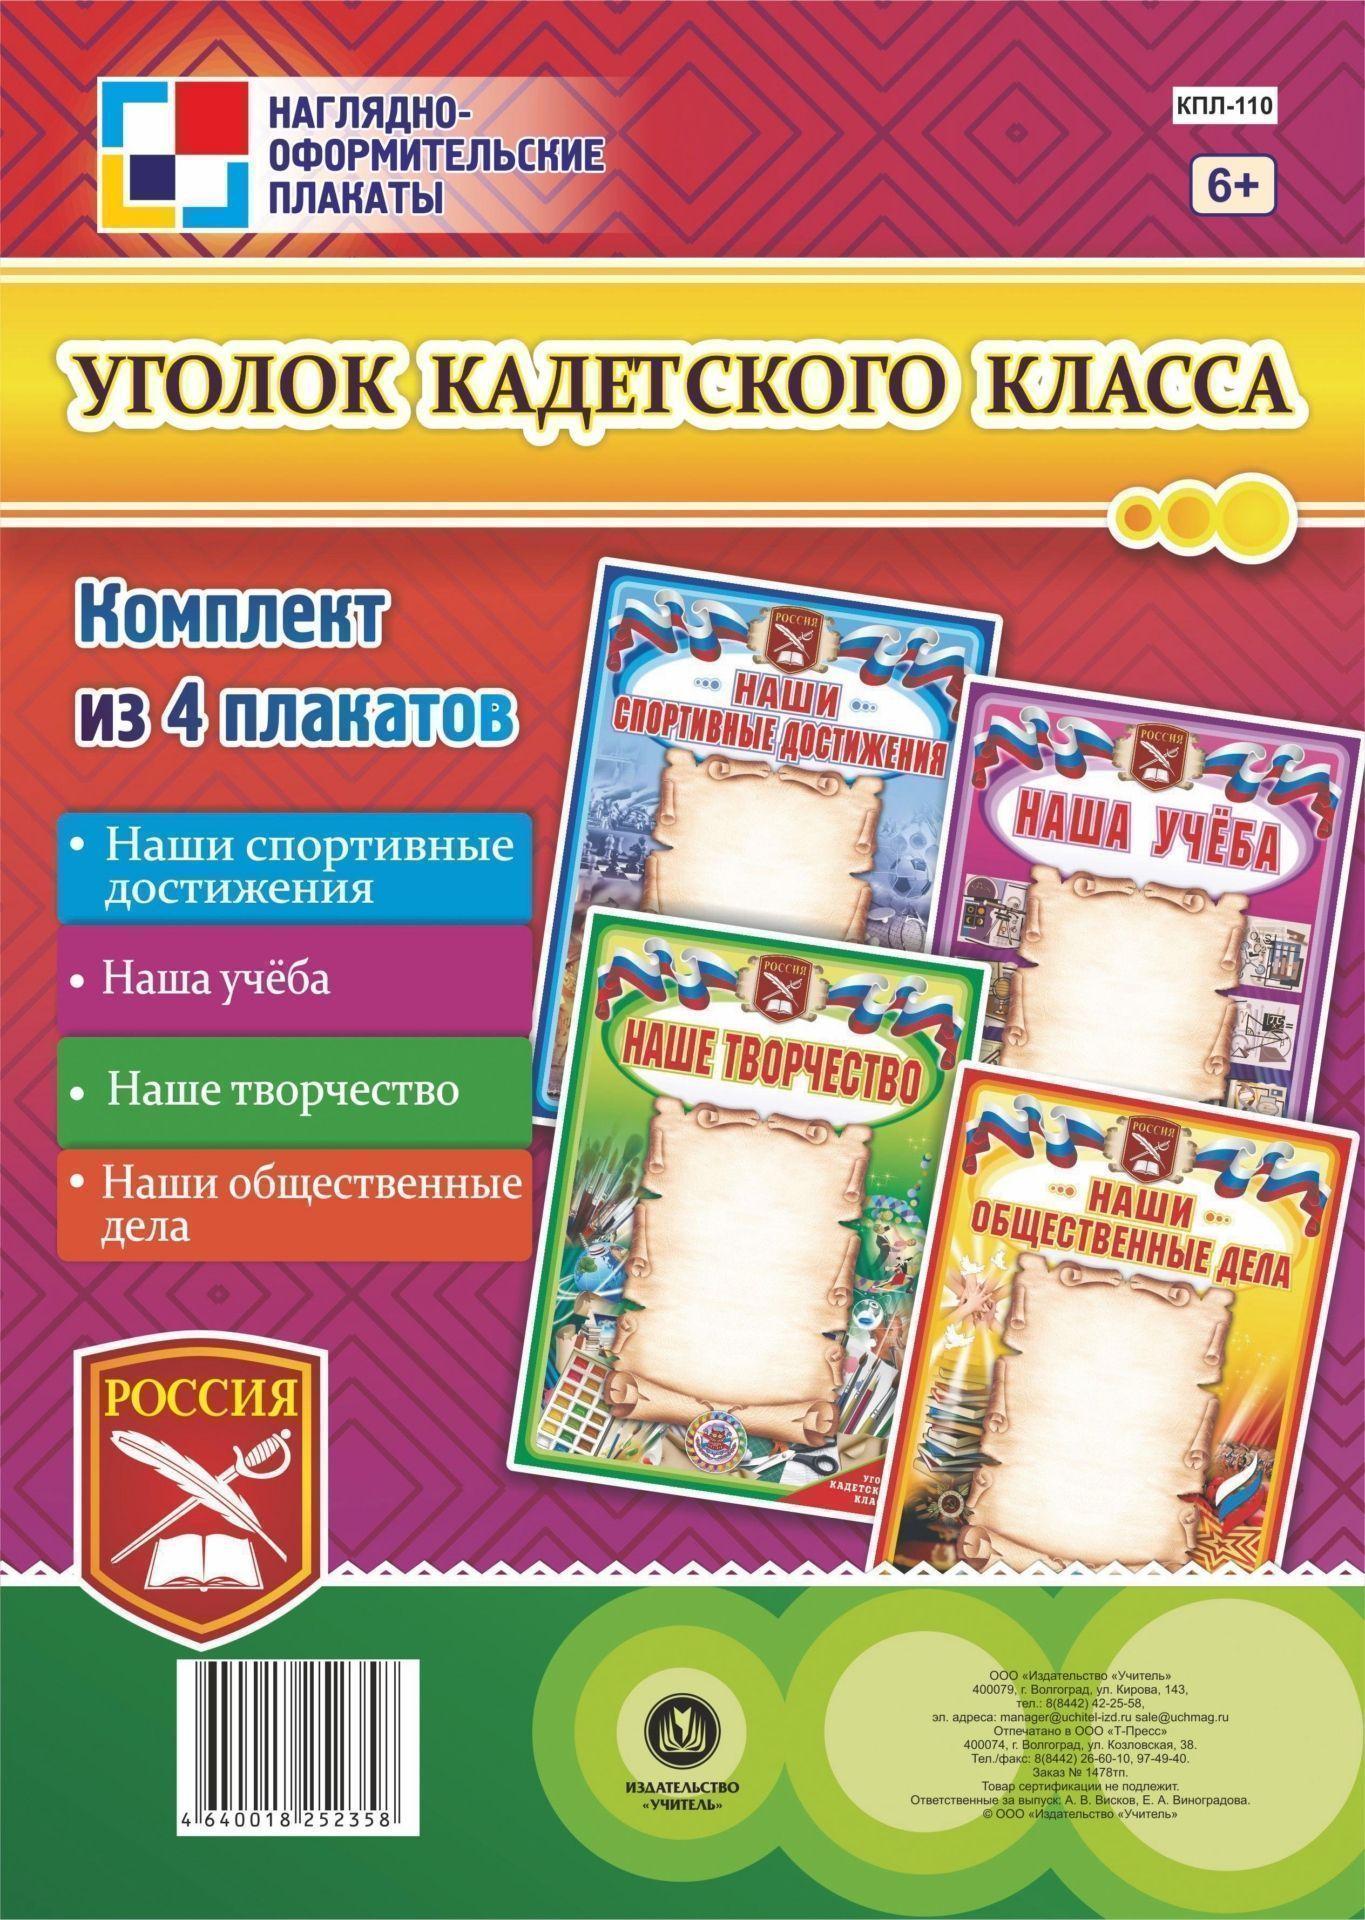 Комплект плакатов Уголок кадетского класса: 4 плаката